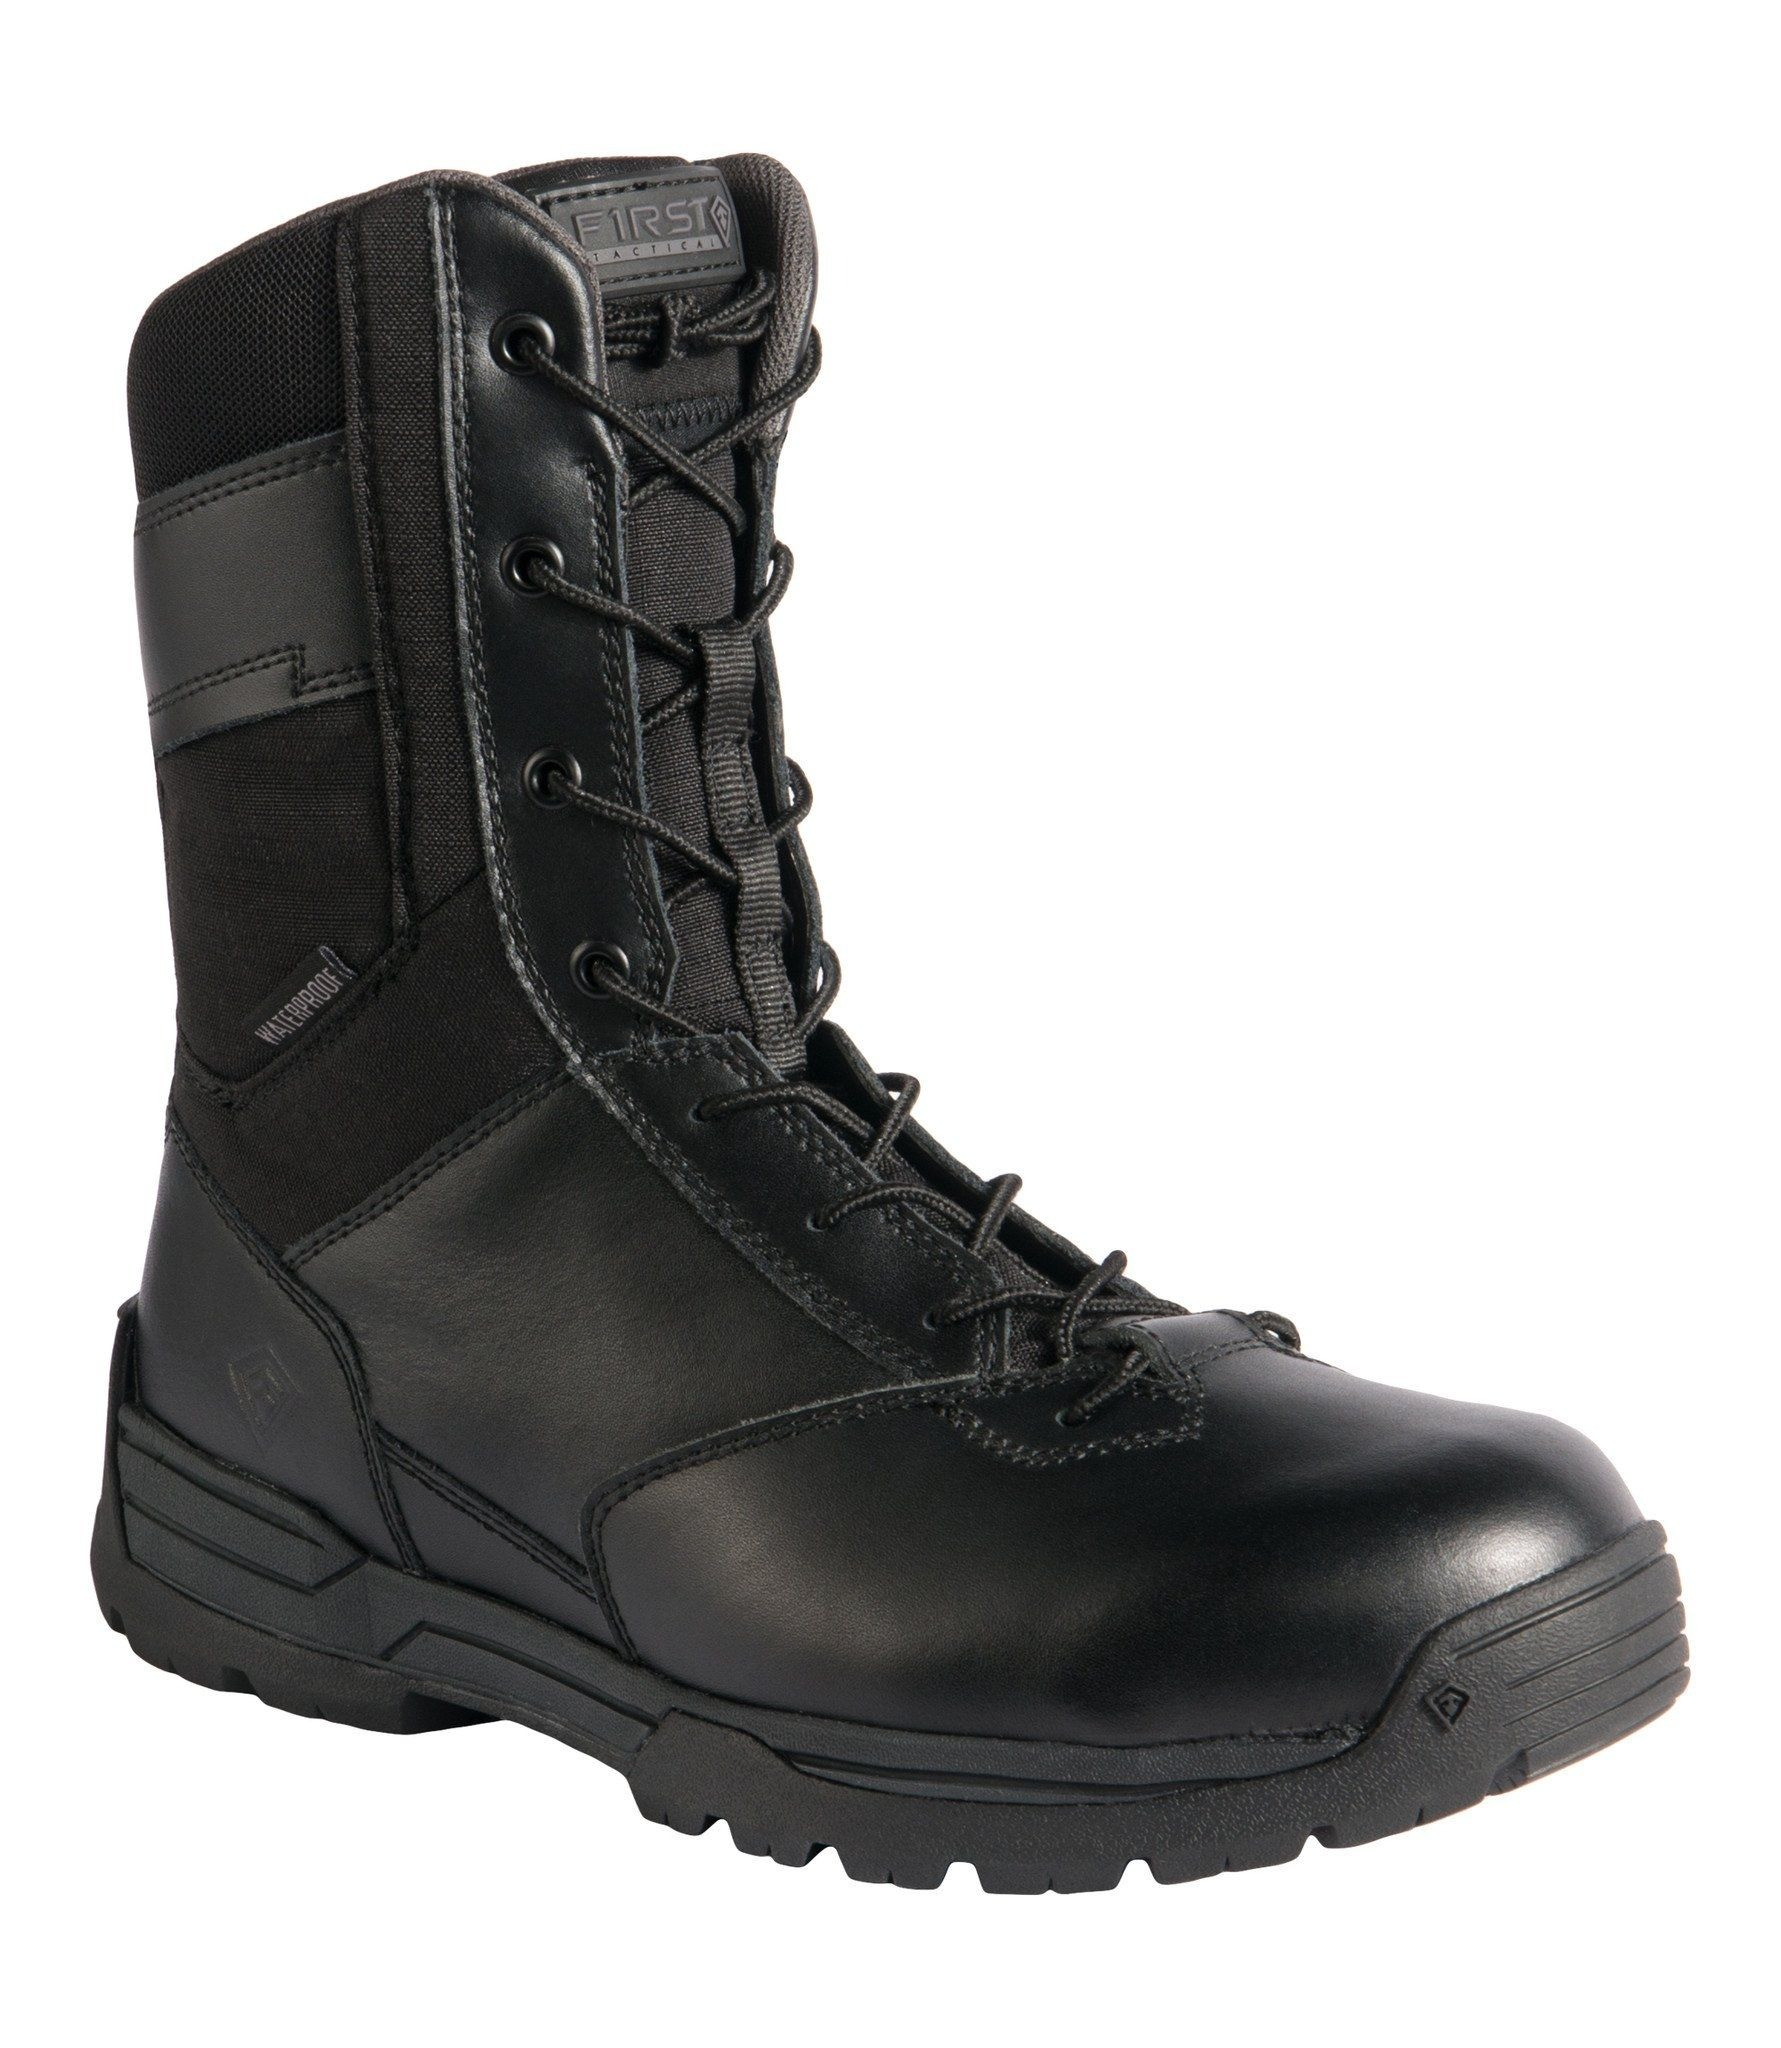 "Image of Buty first tactical m's 8"" wp side zip duty 165003 - kolor czarny (019), rozmiar (a) 44 (u1t/165003 019 9,5 - 44)"